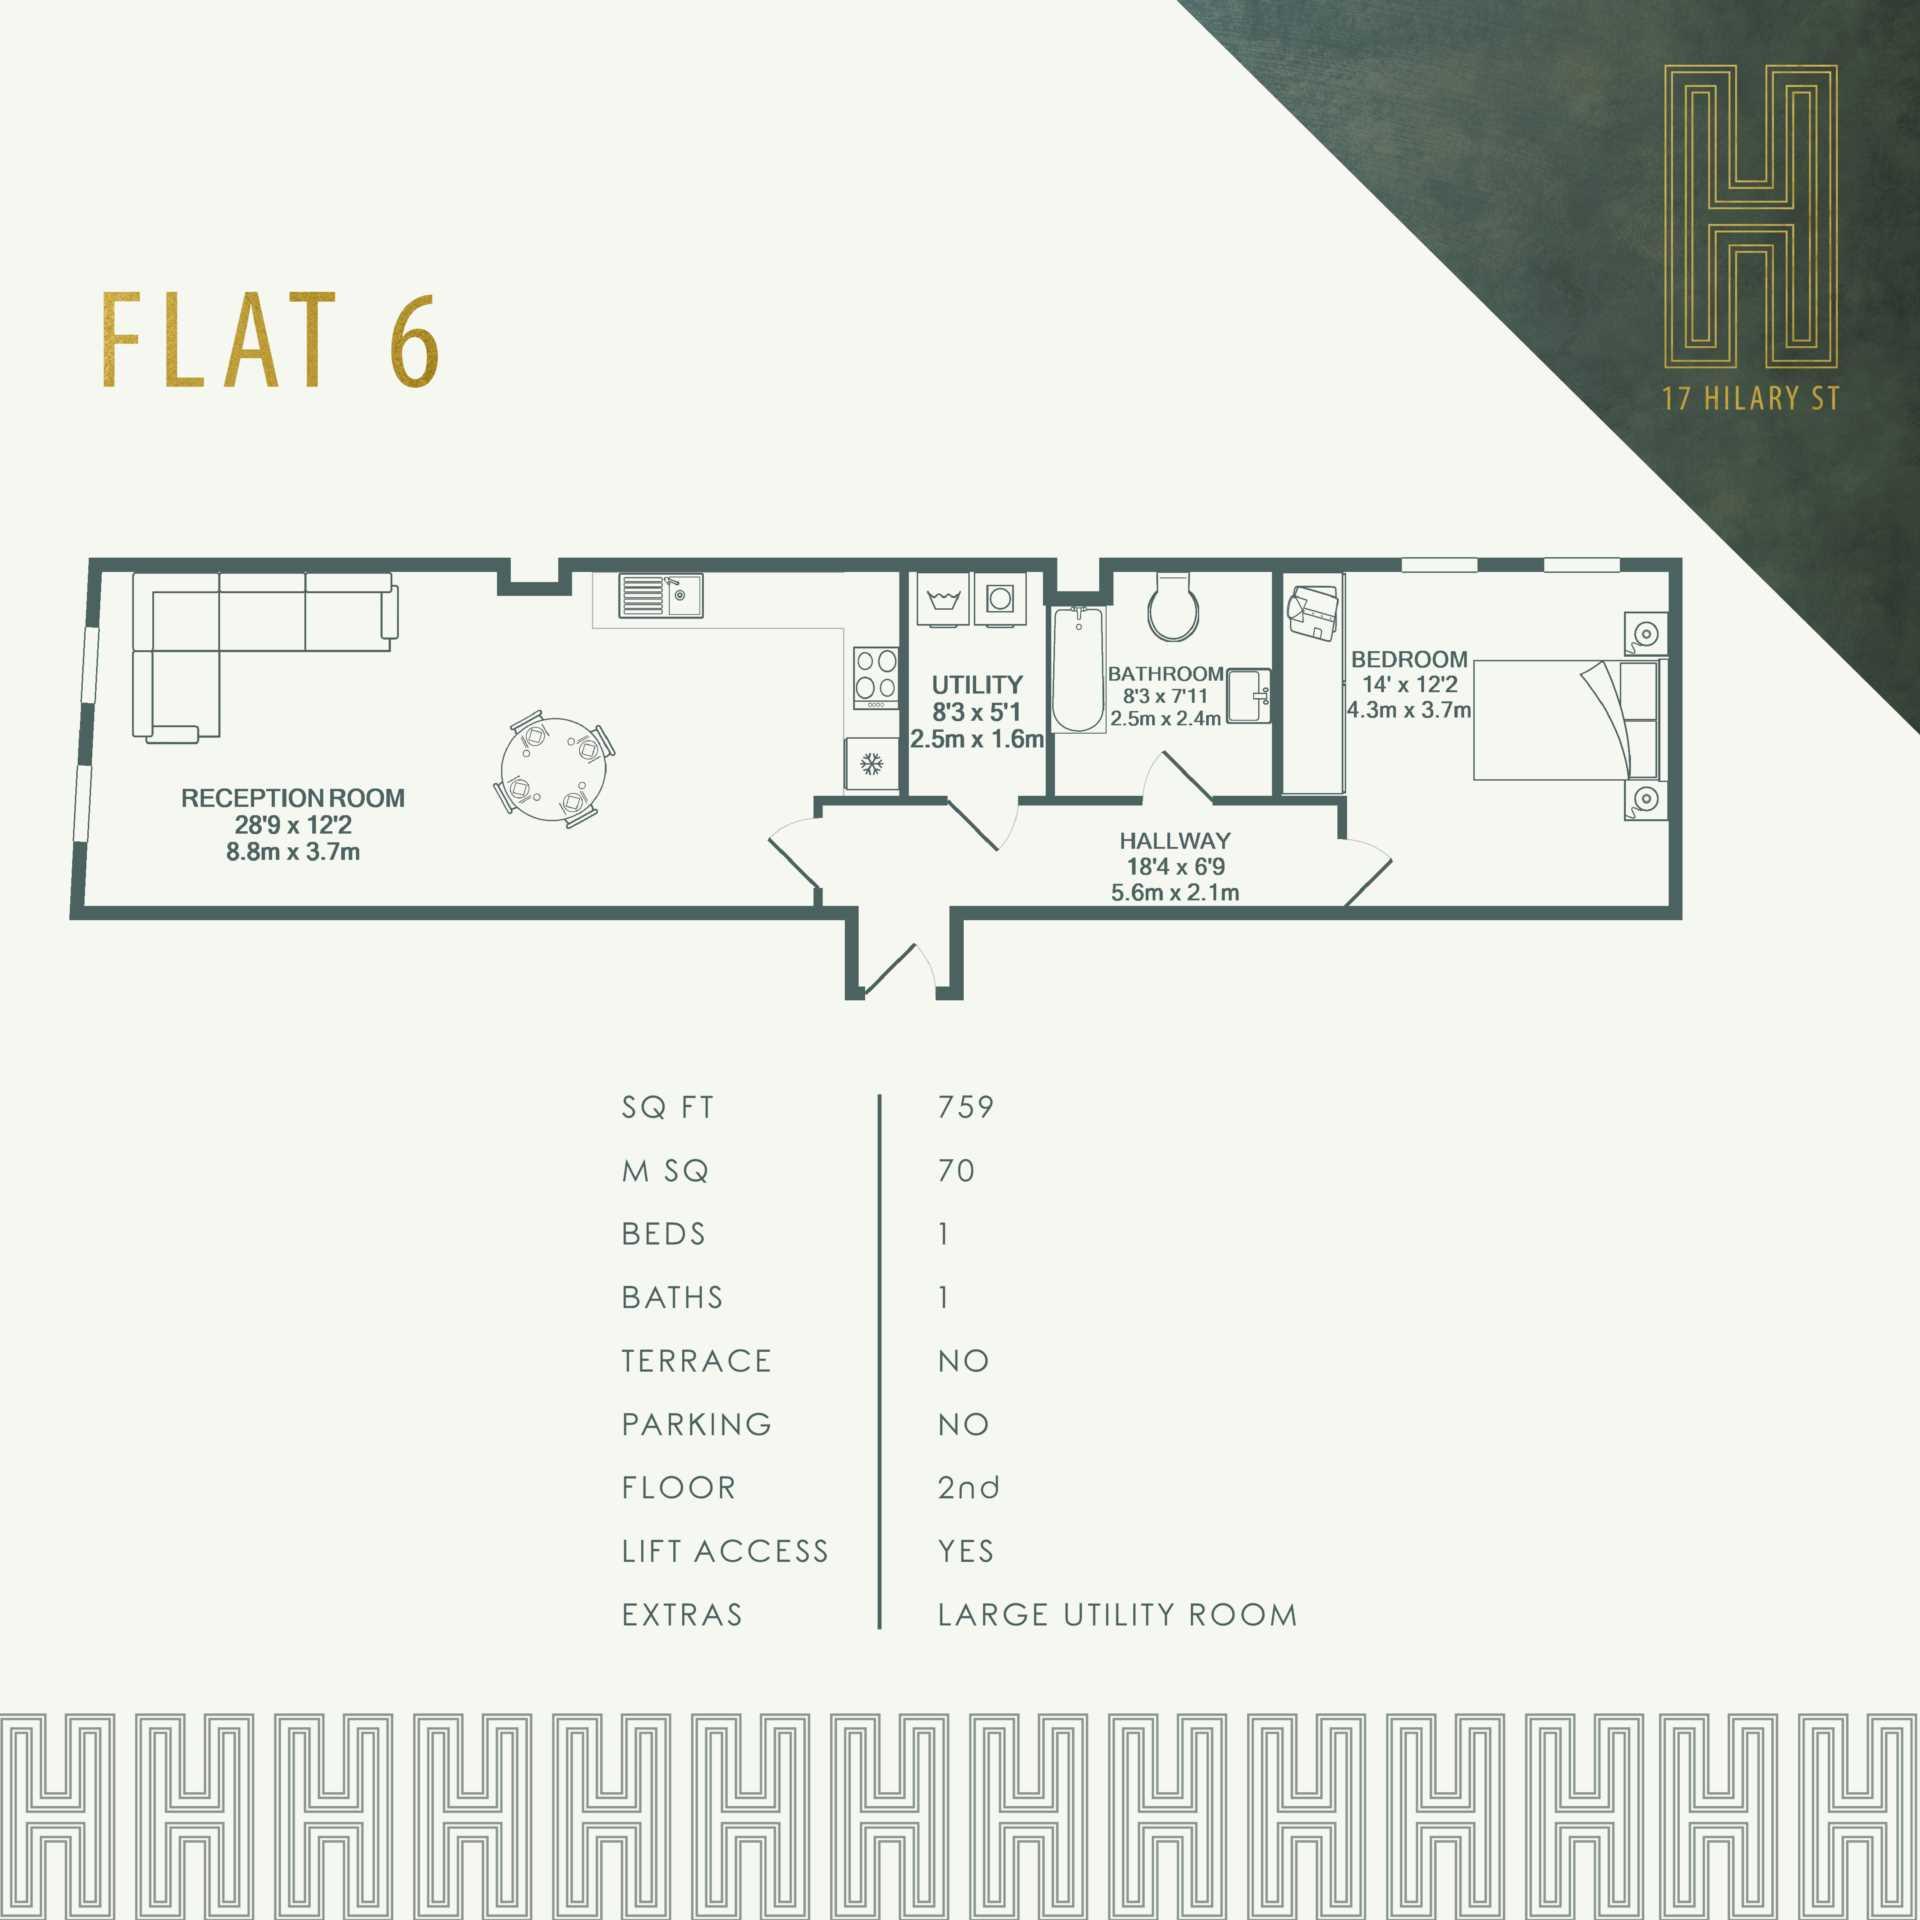 Flat 6, 17 Hilary Street, Image 3